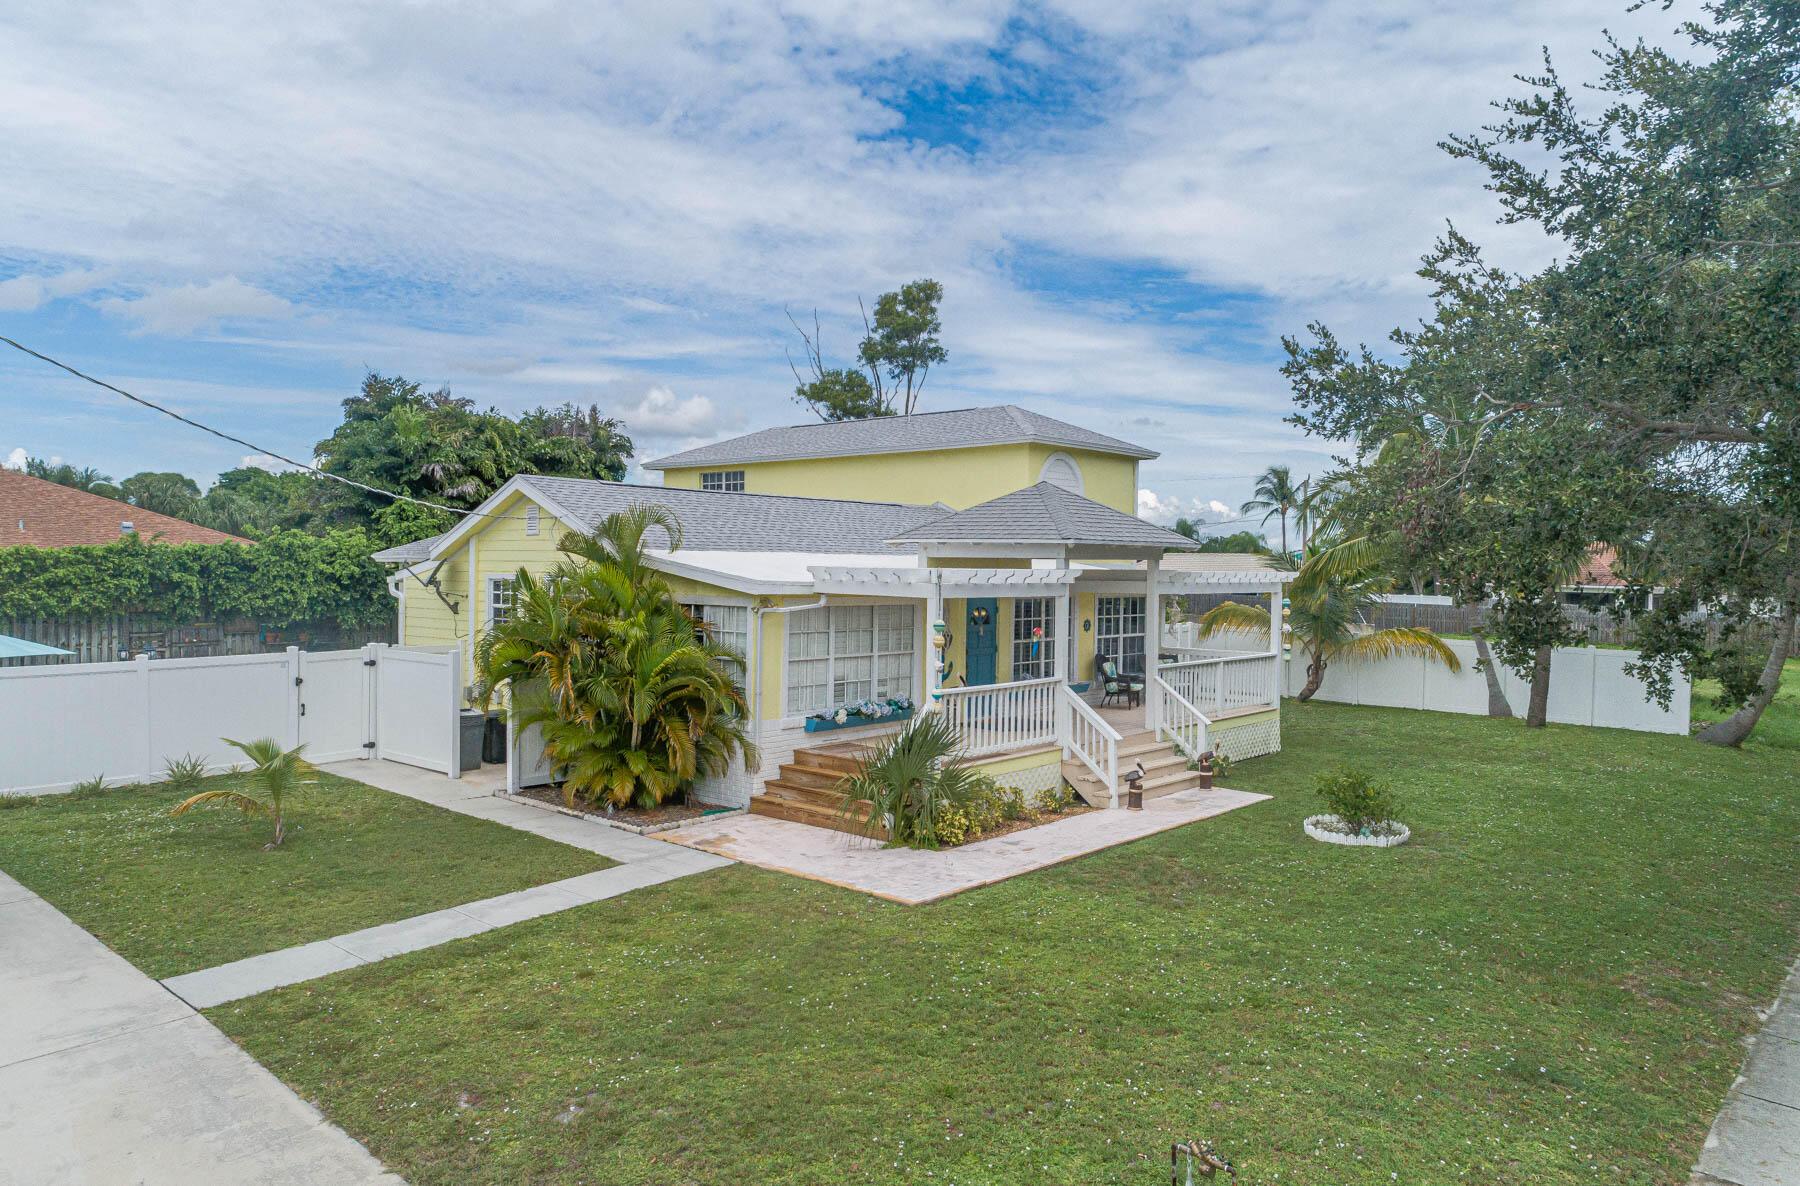 475 Seabrook, Tequesta, Florida 33469